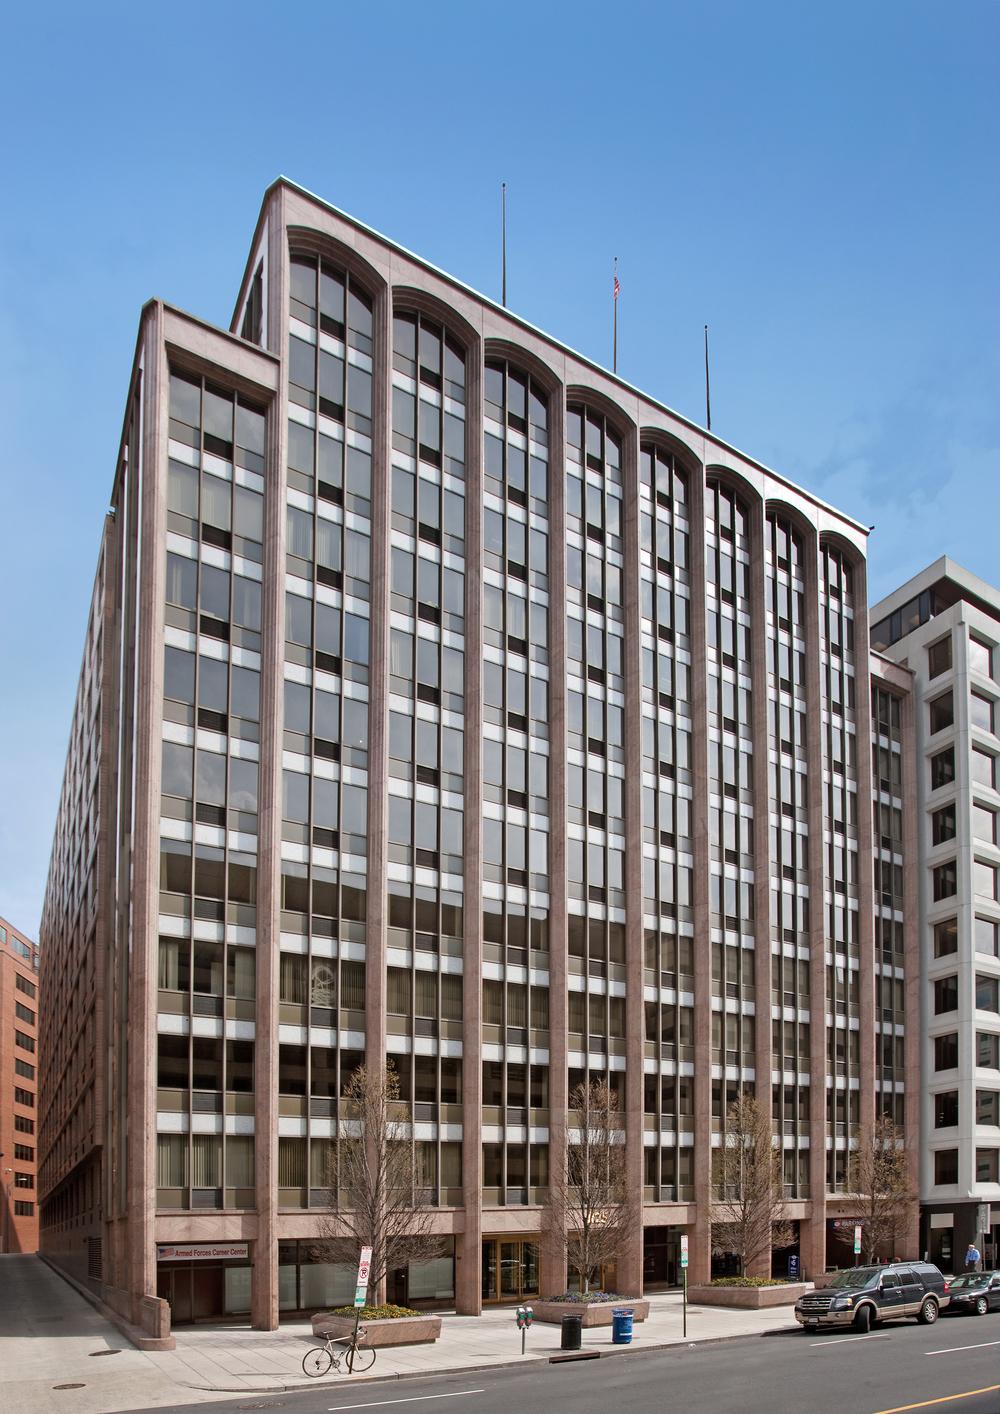 1125 15th Street, NW; Washington, DC 20005